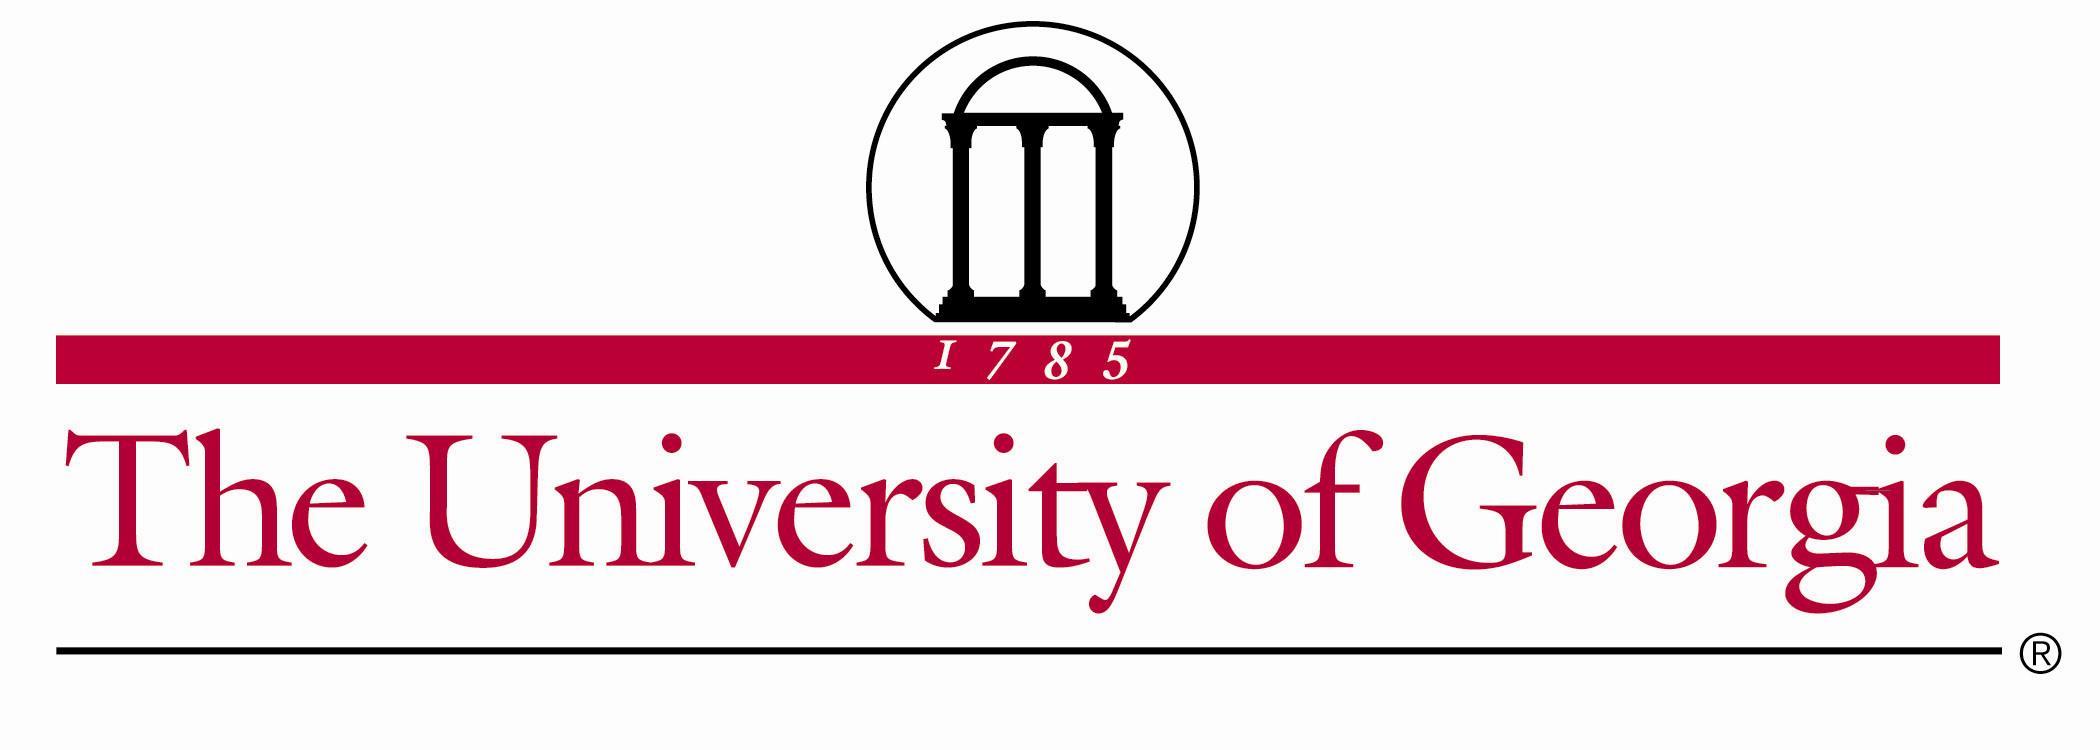 University of Georgia   FIRE 2100x750